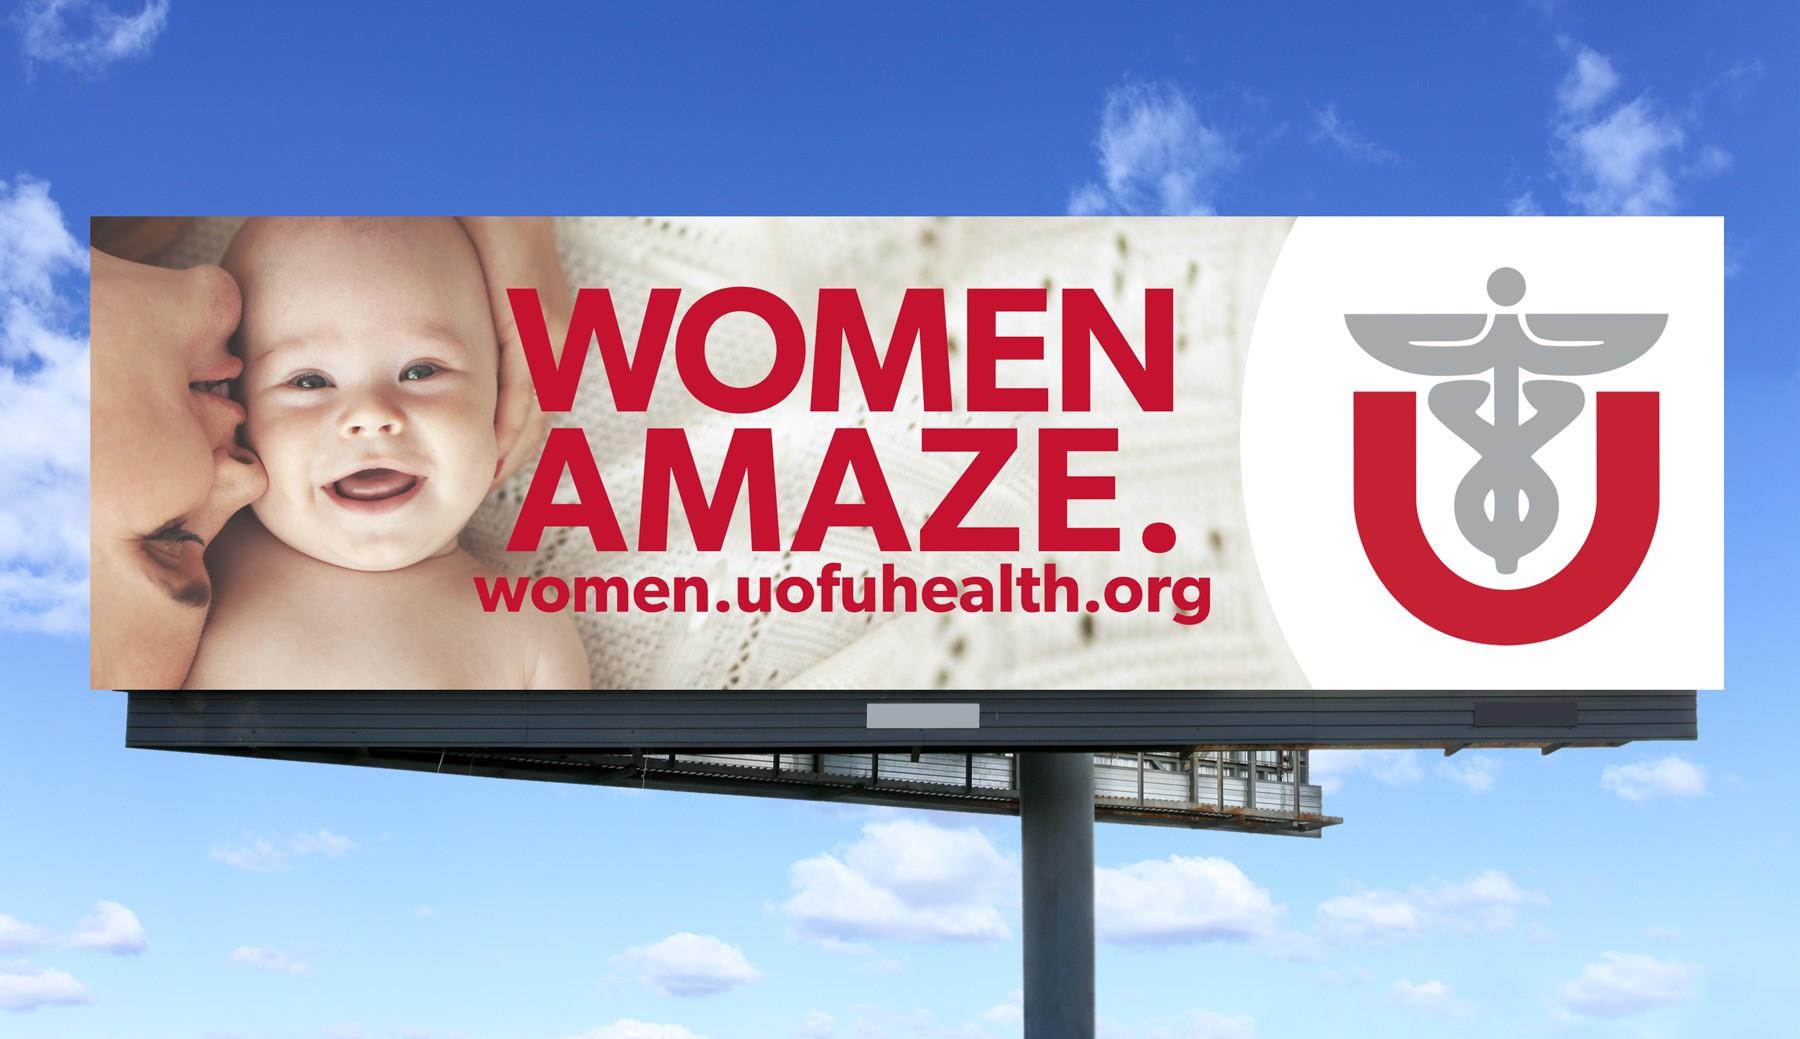 University of Utah Healthcare women amaze billboard